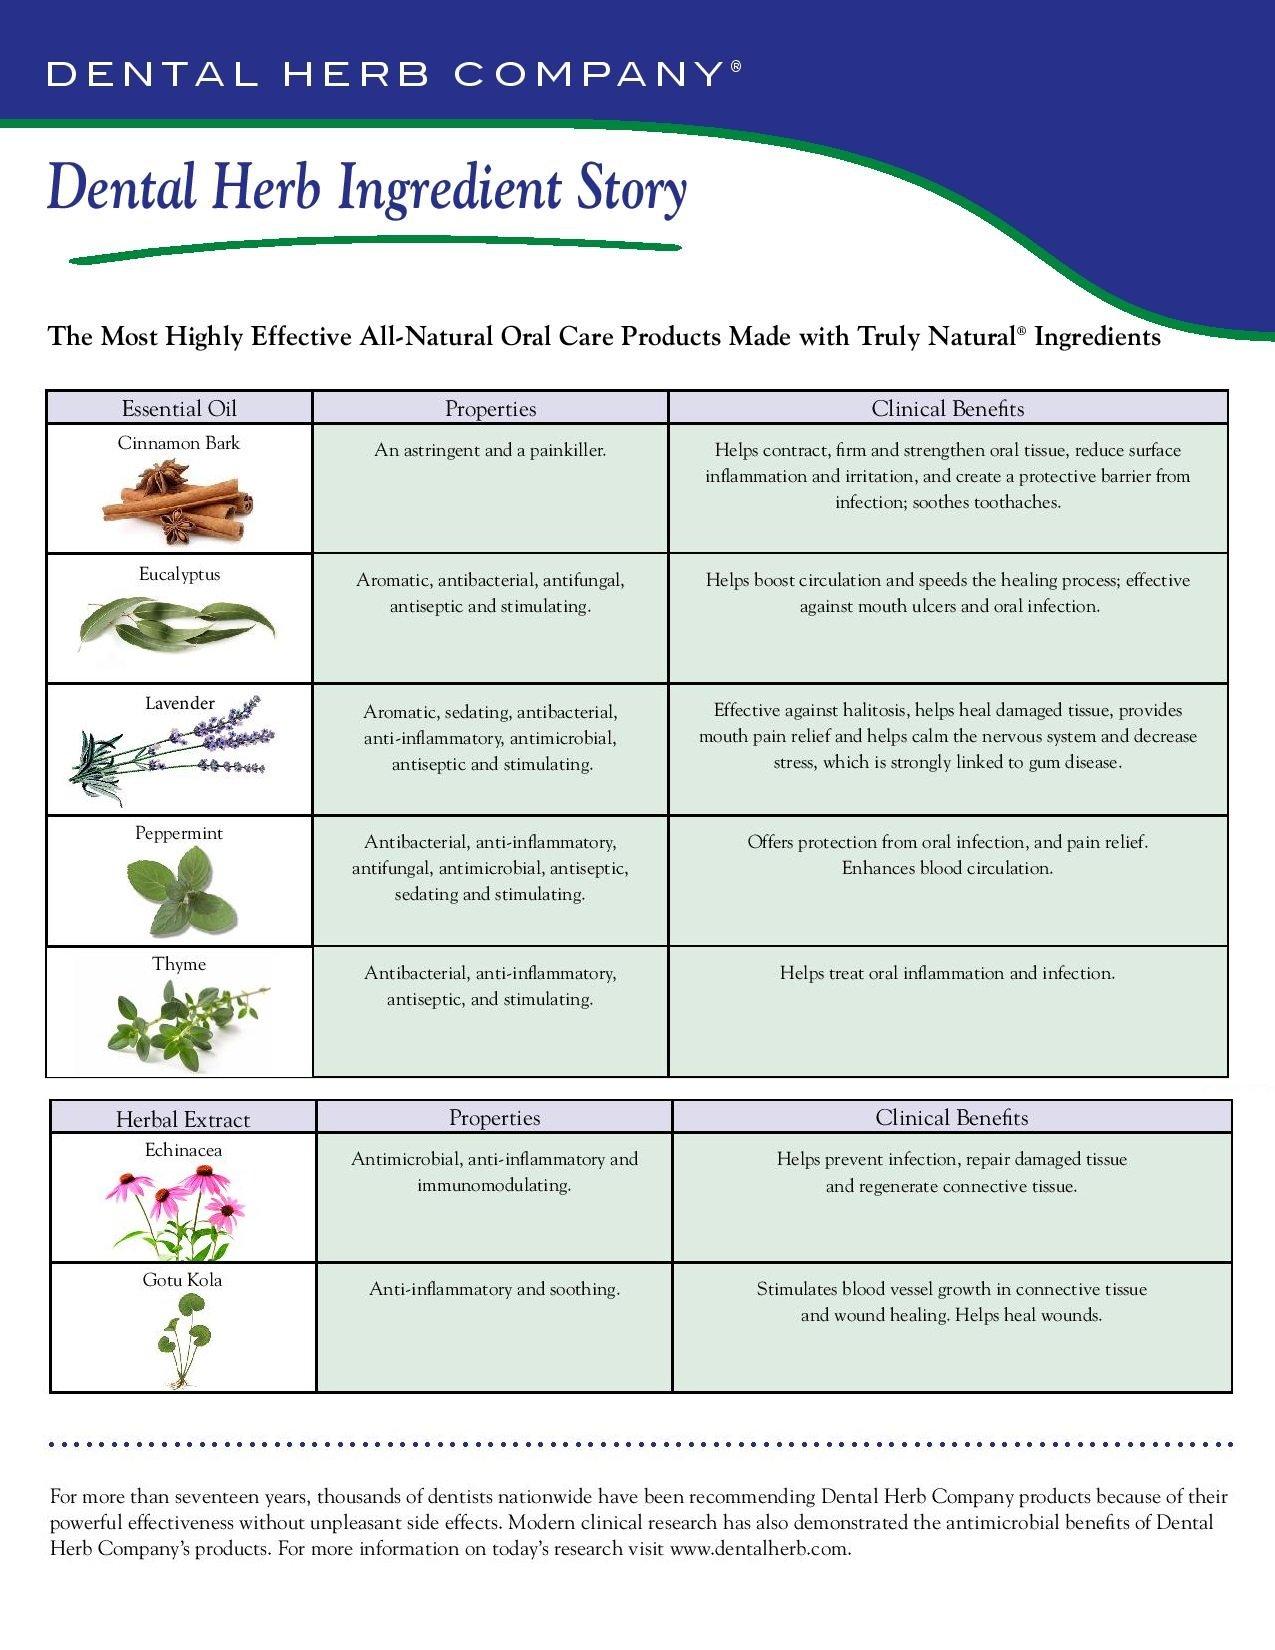 Dental Herb Company Travel Size Tonic + 3-Piece Dental Hygiene Kit